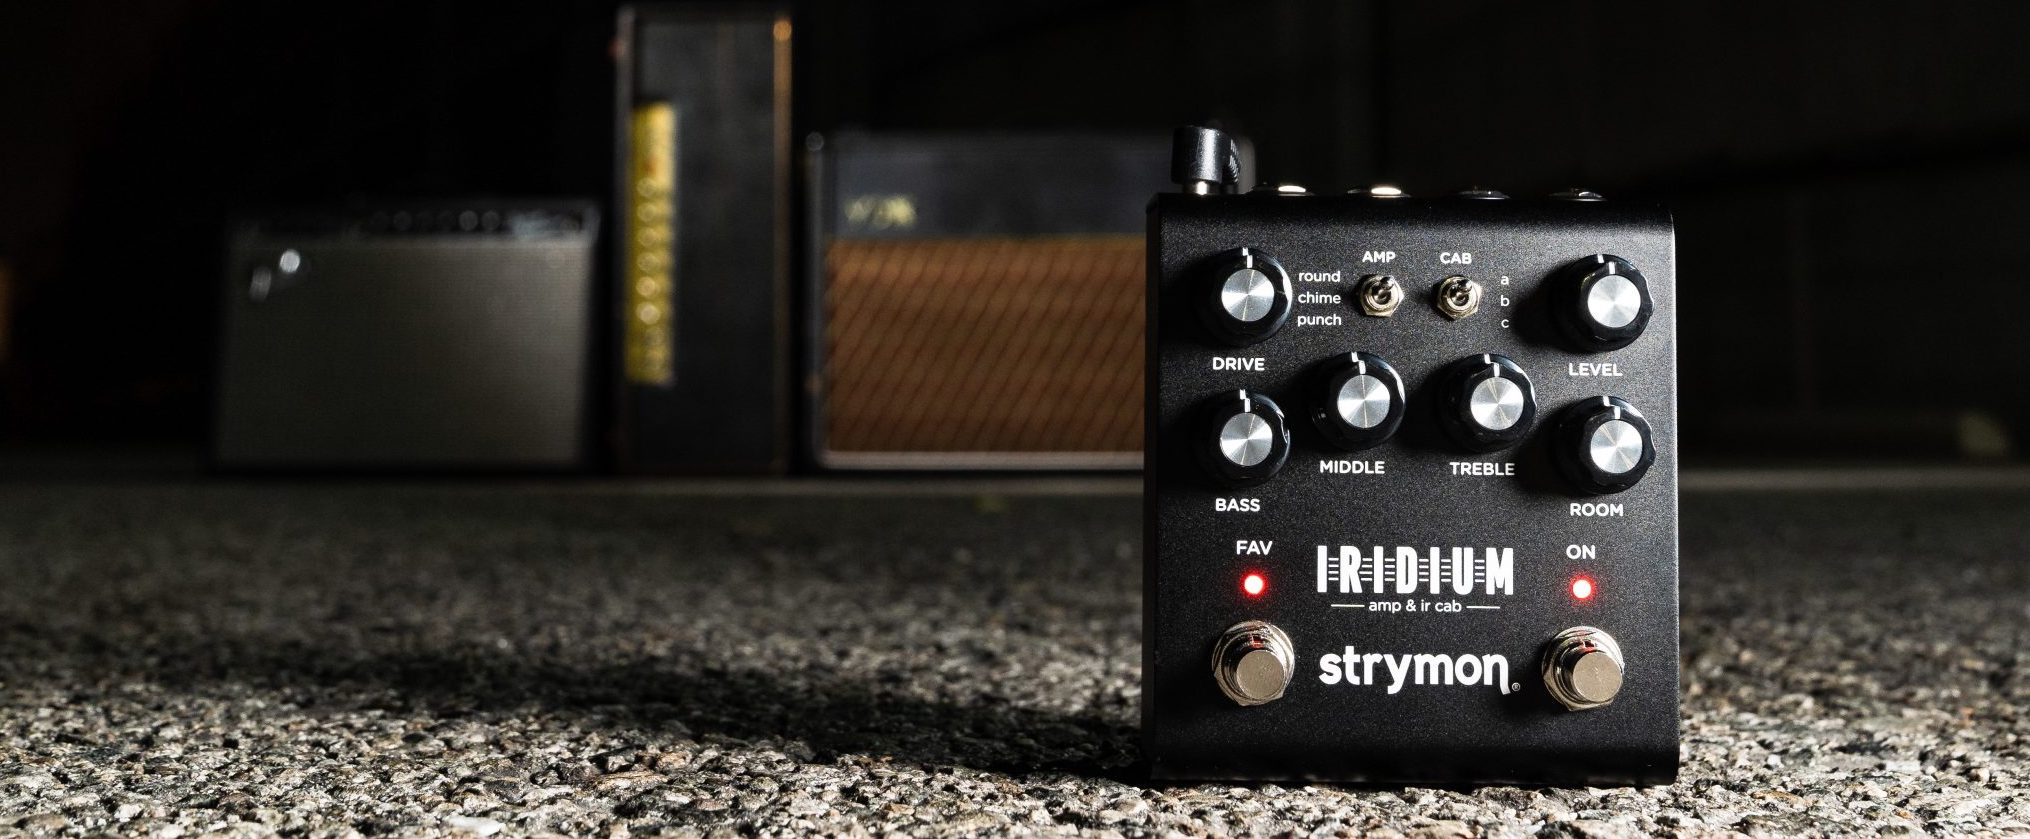 Strymon Iridium - Ampless Guitar Rigs - Andertons Music Co.